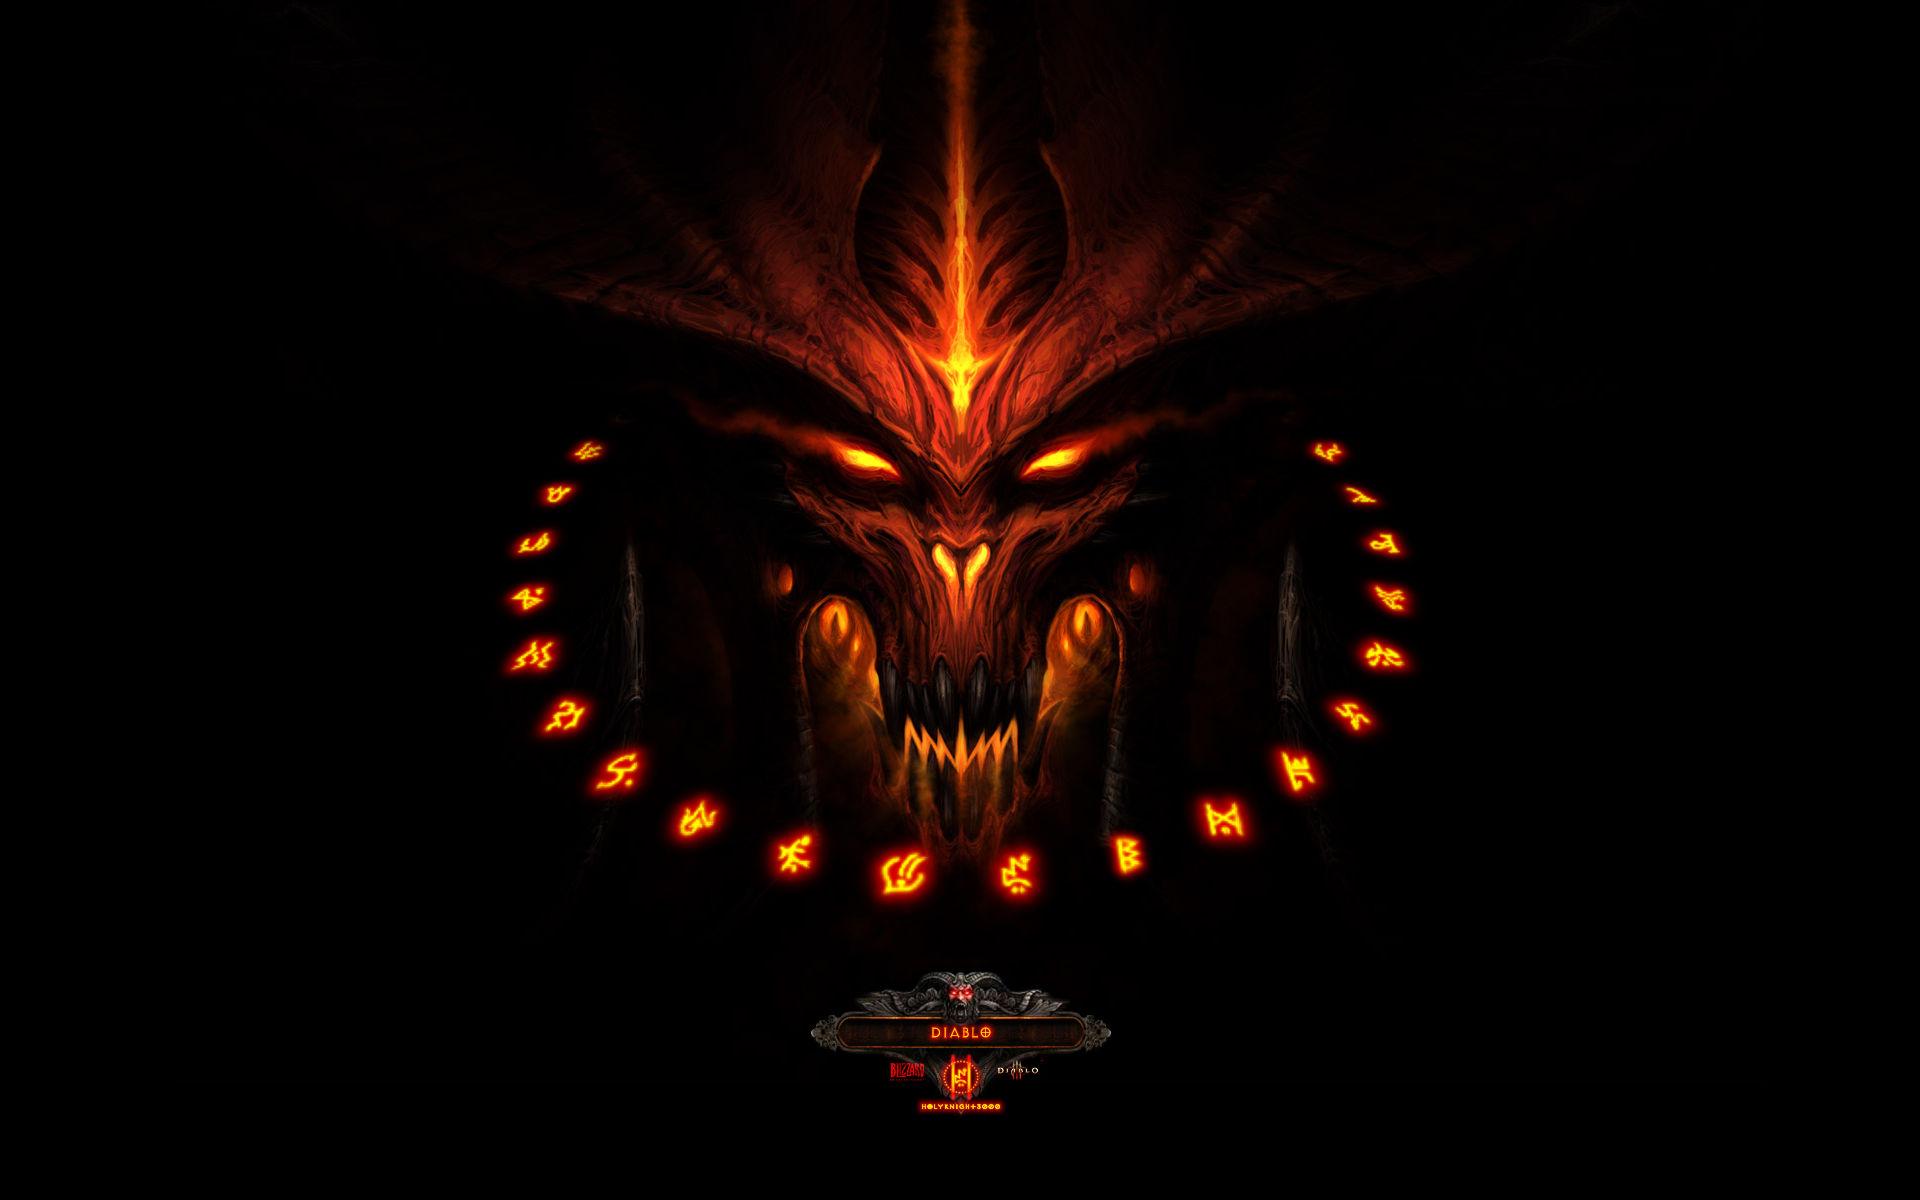 Diablo II by Holyknight3000 Diablo II by Holyknight3000